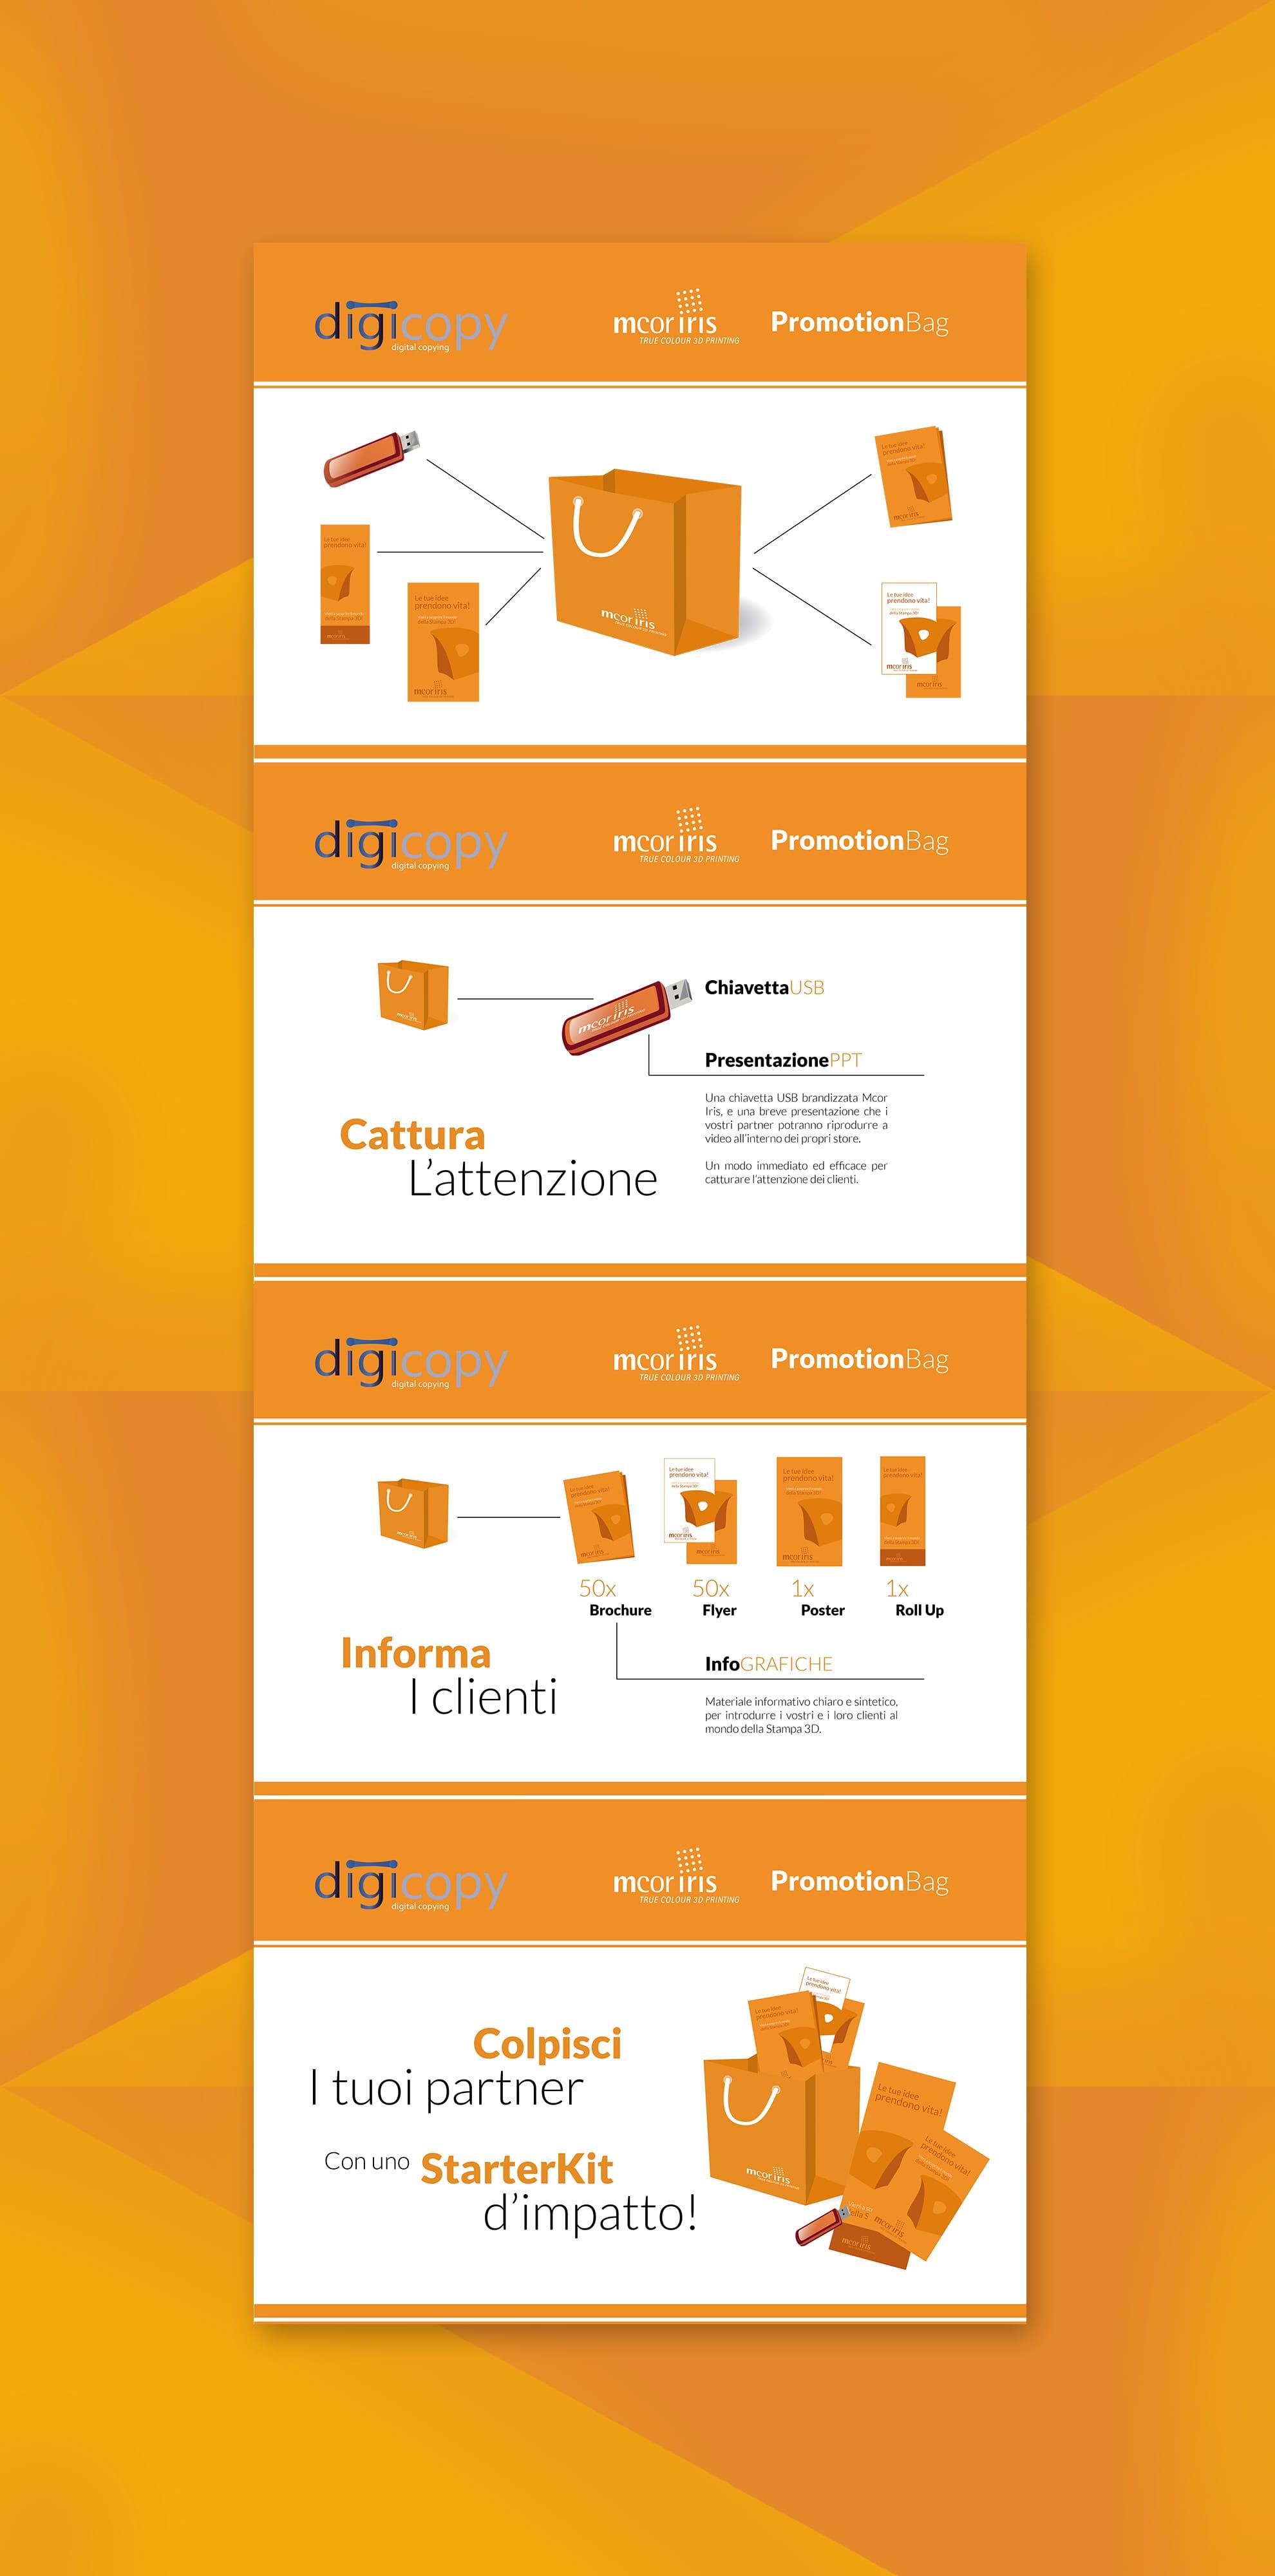 digicopy-portfolio-grafica-paper-3d-print-presentation-starter-kit-web